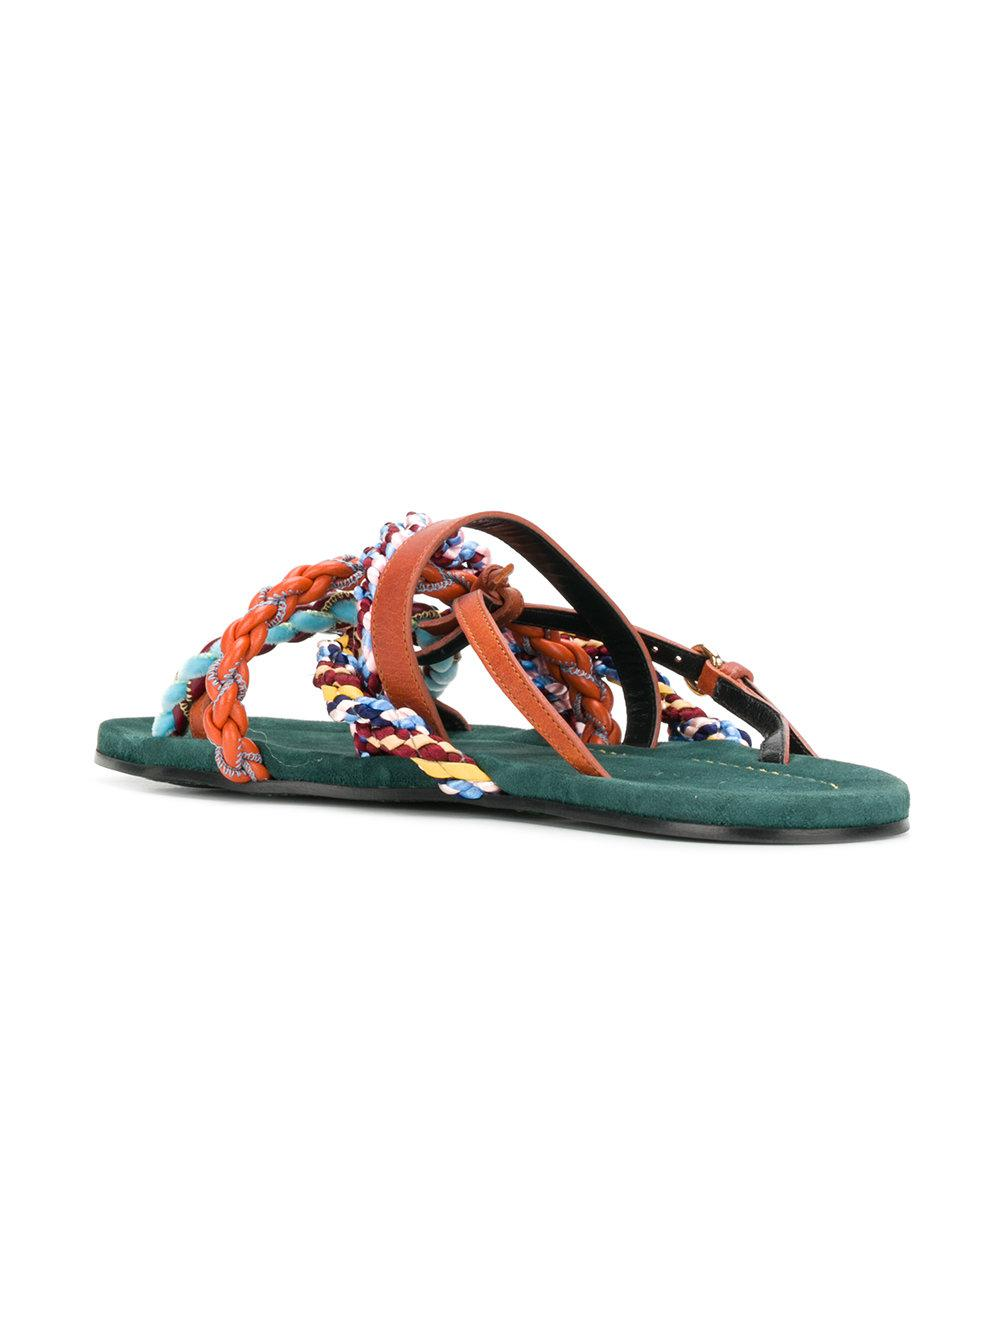 braided sandals - Green Carven vmvY6